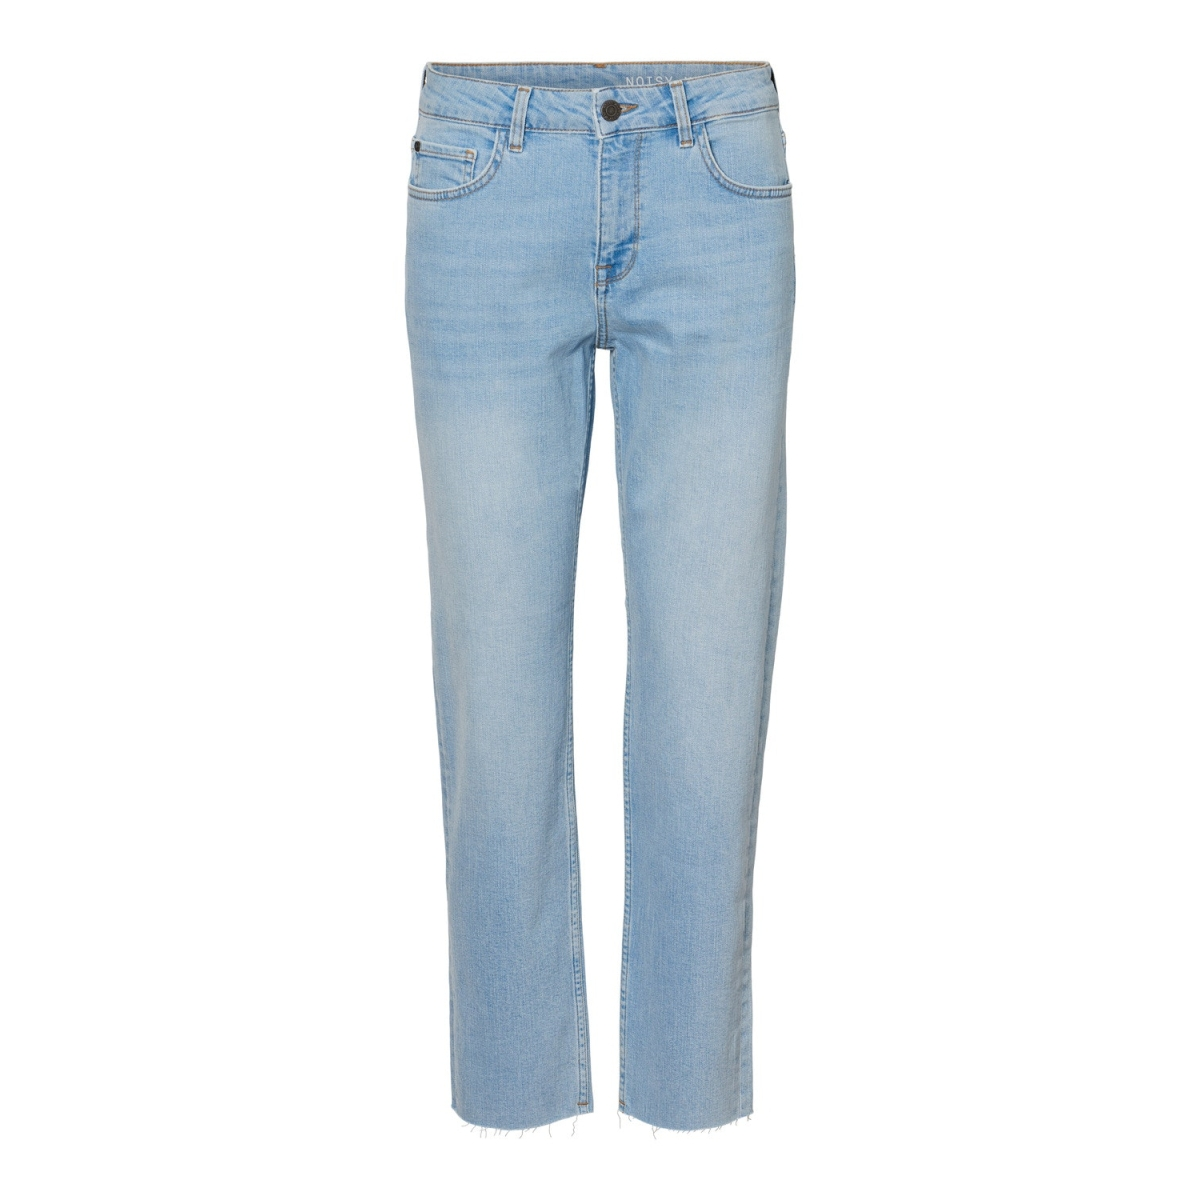 nmjenna nw strght ank jeans ki013lb 27010856 noisy may jeans light blue denim